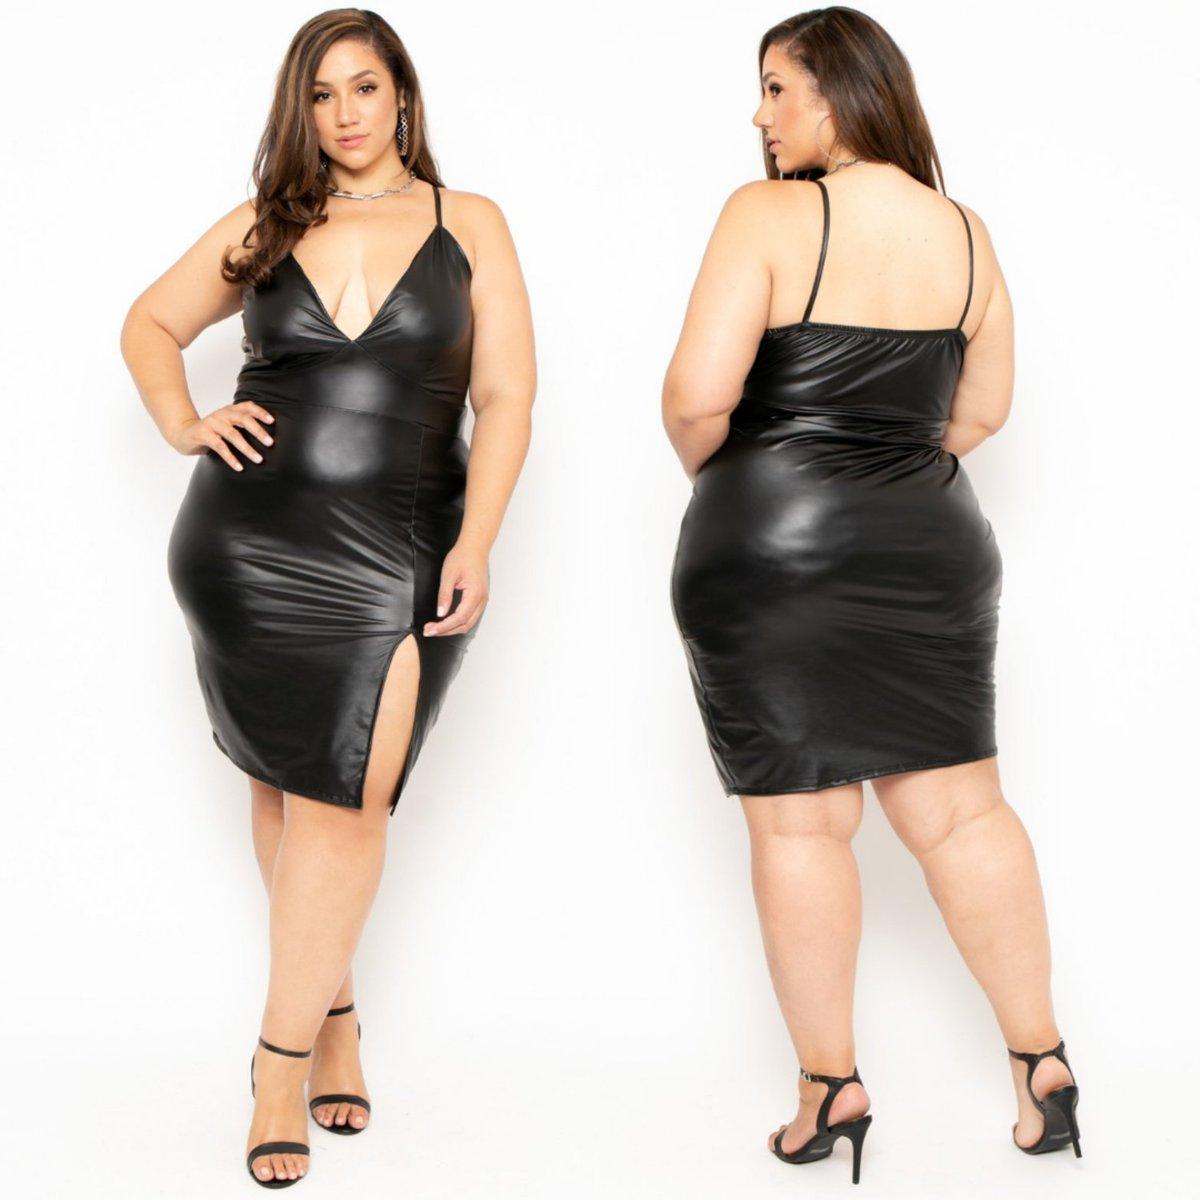 91ddec0c2ff Shop new little black dresses